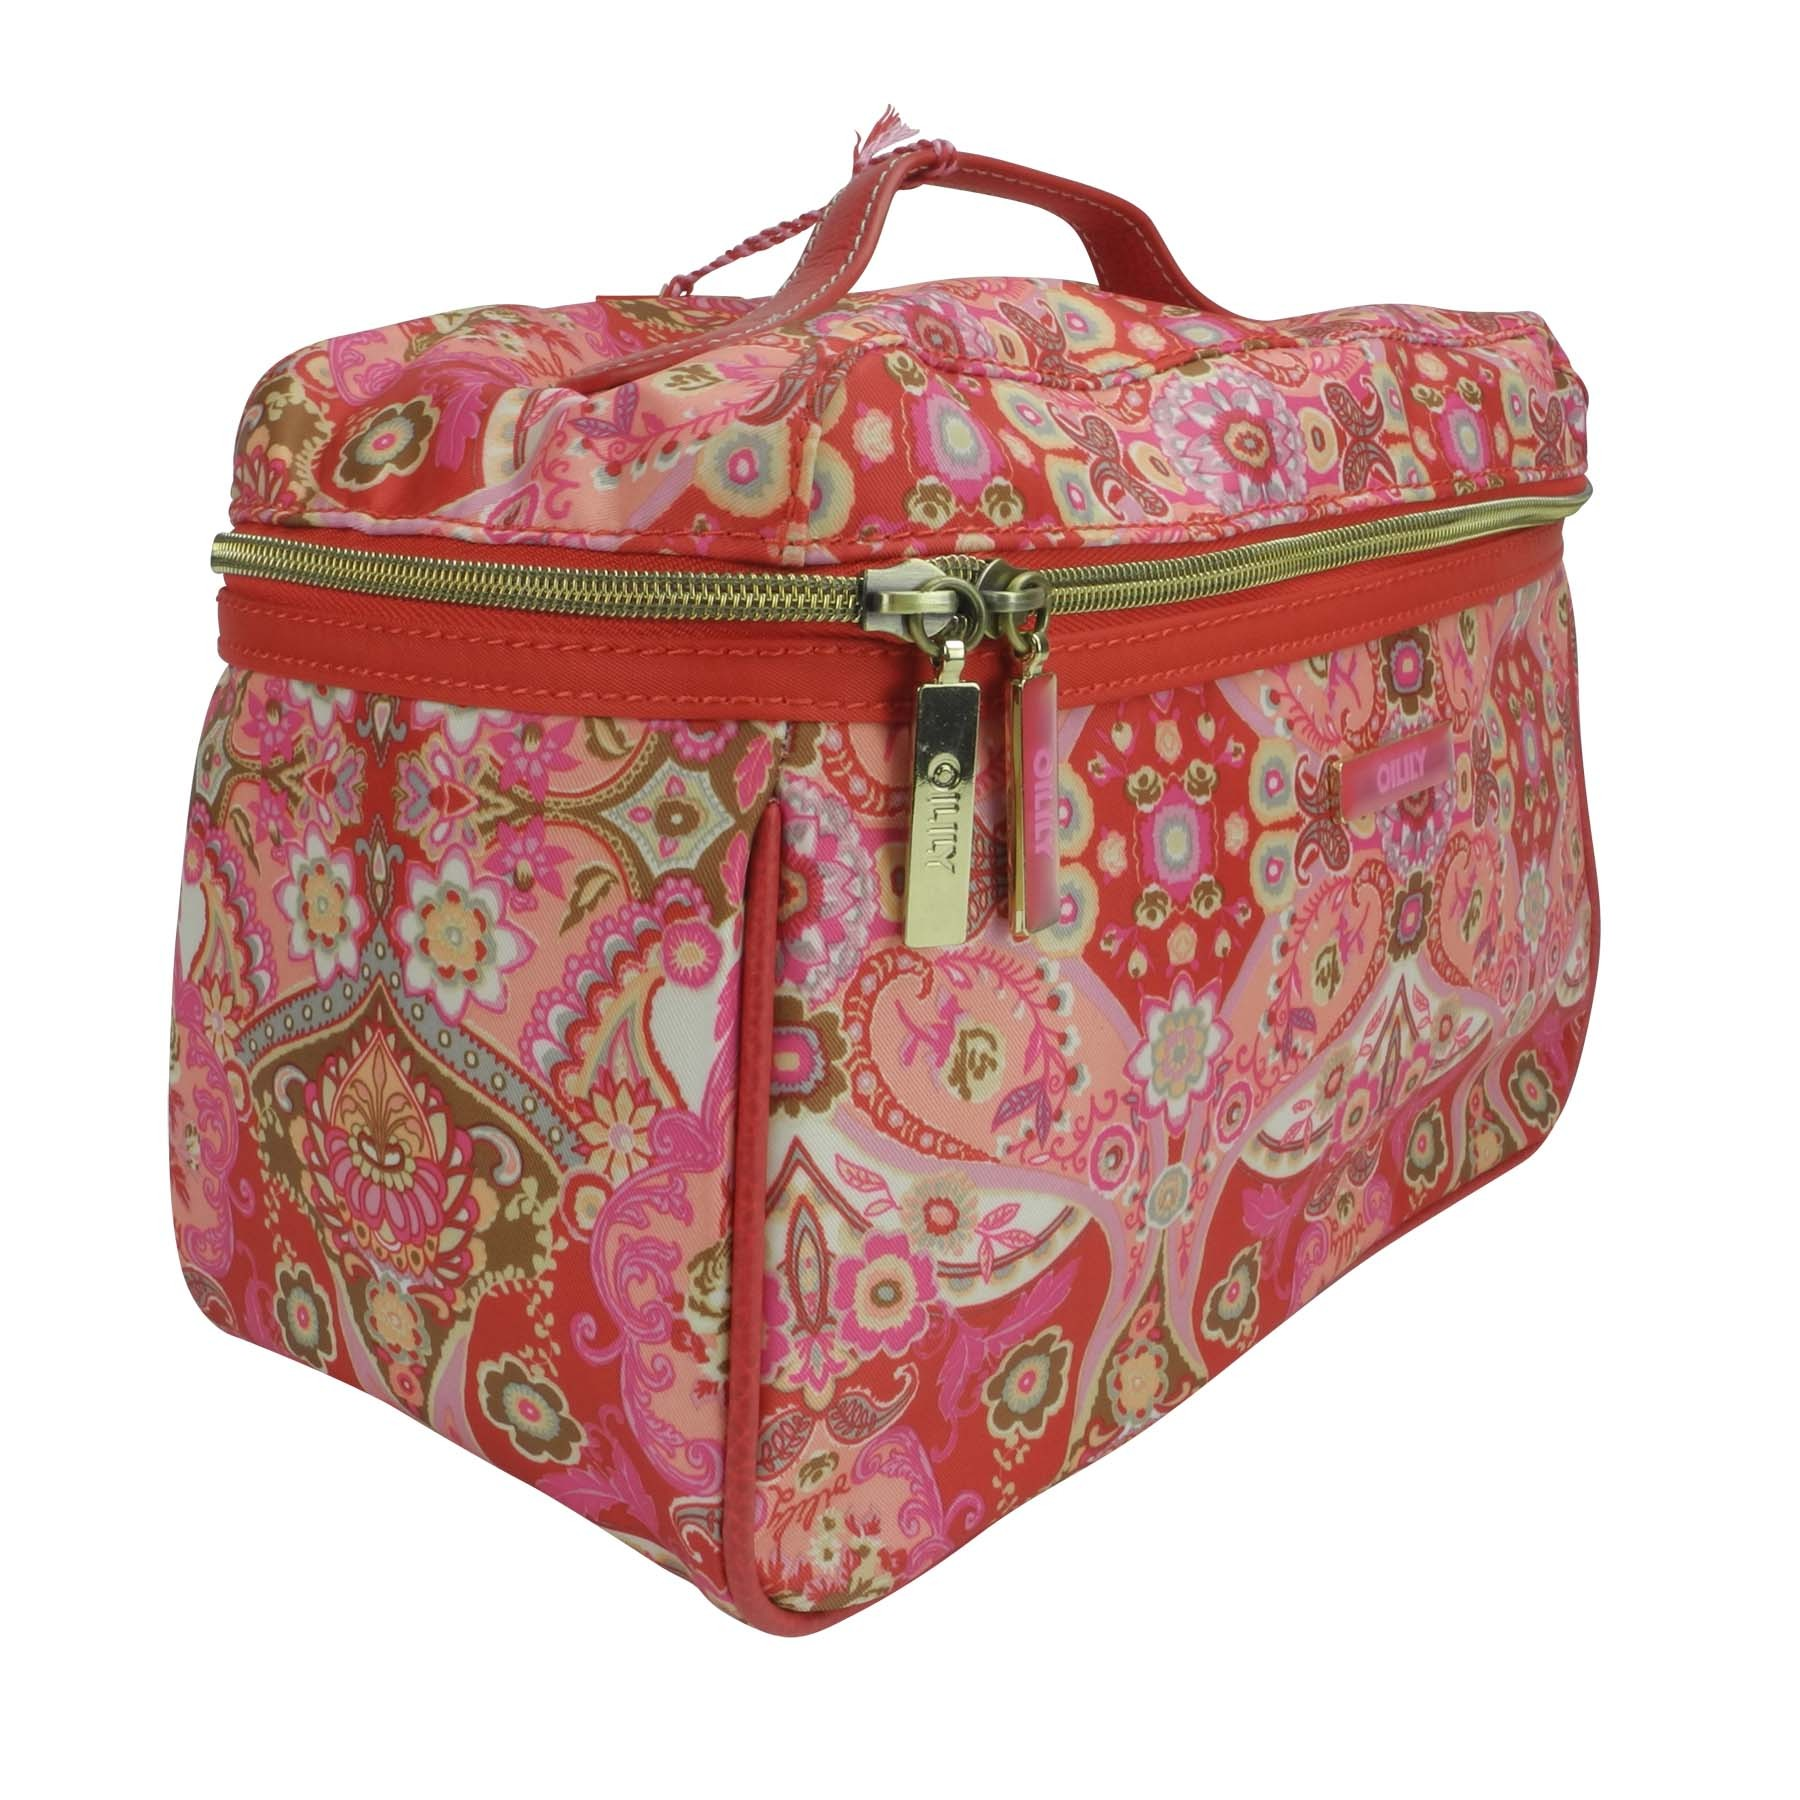 oilily summer mosaic kosmetiktasche l beauty case strawberry ebay. Black Bedroom Furniture Sets. Home Design Ideas